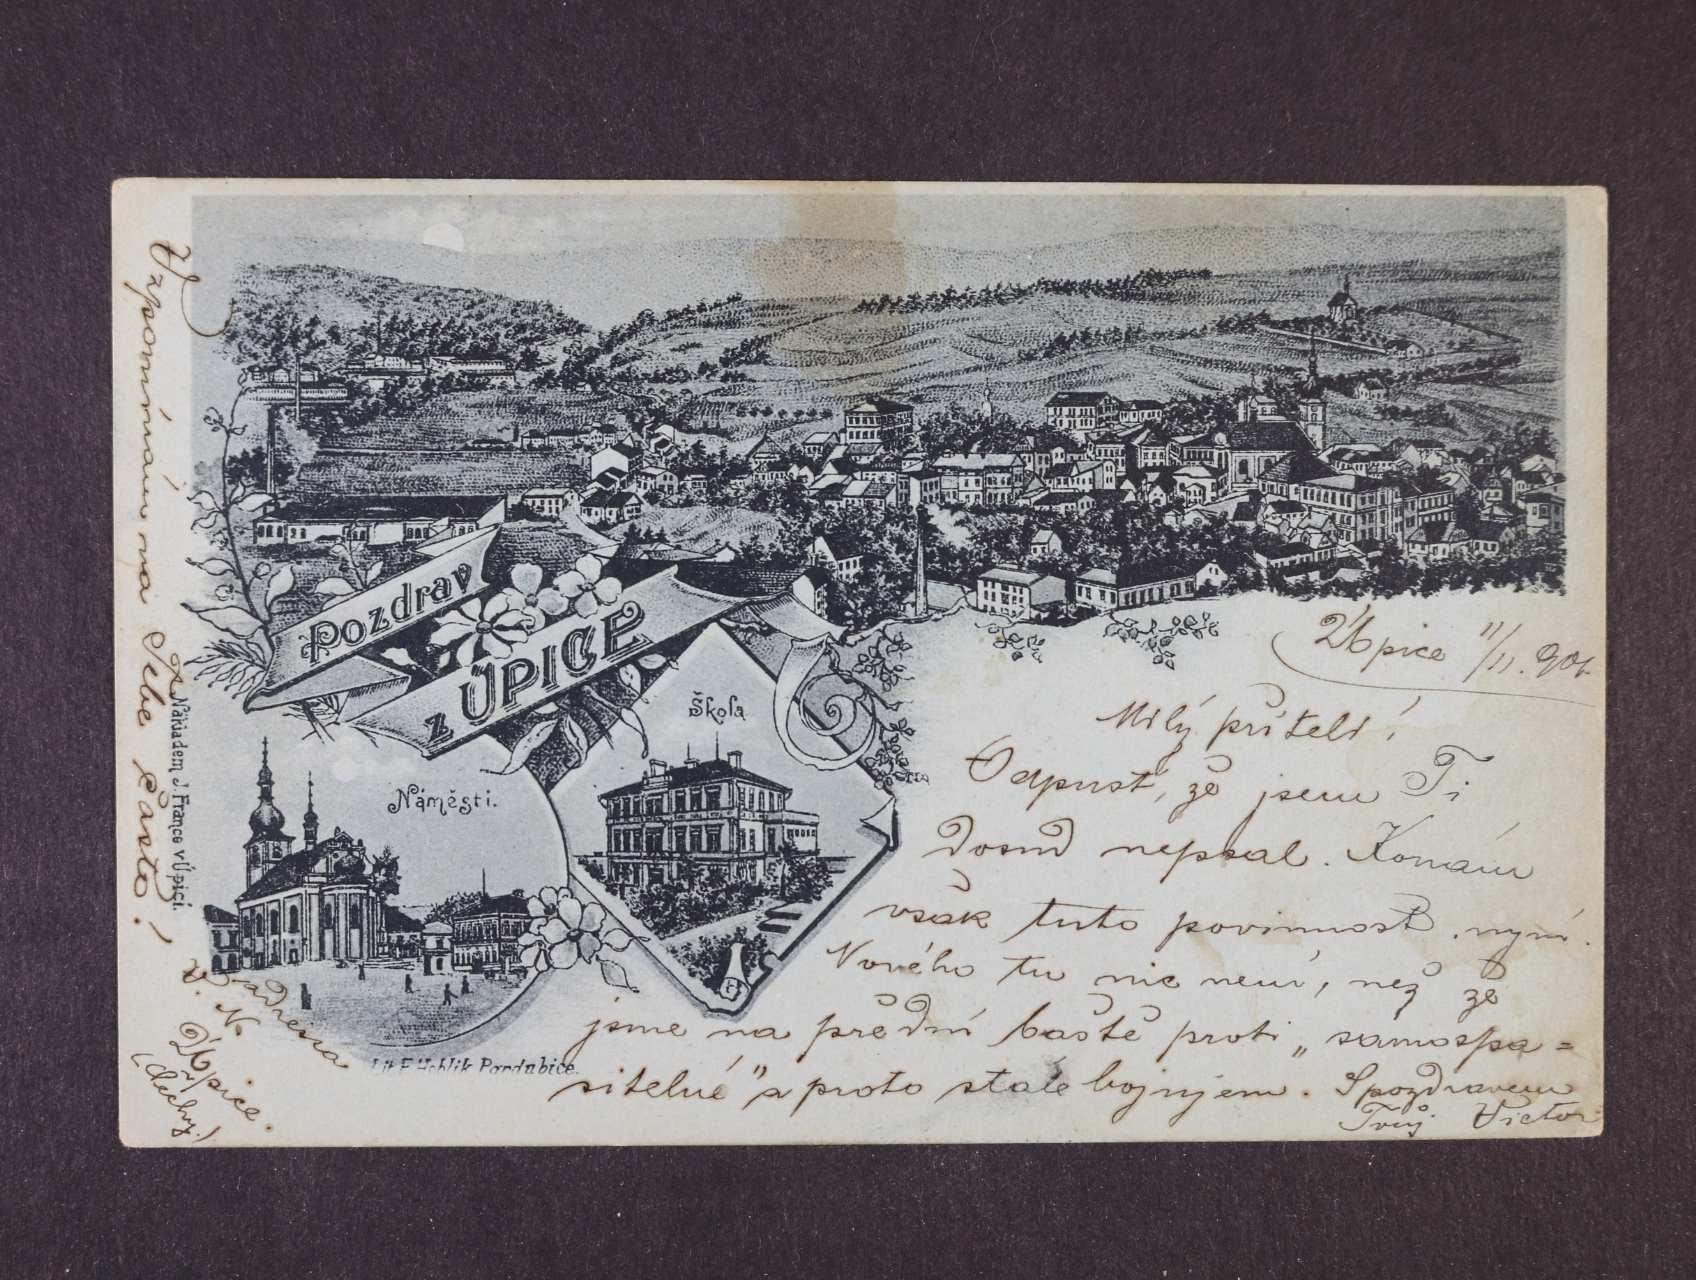 Úpice - jednobar. litograf. koláž, dl. adresa, použitá 1901